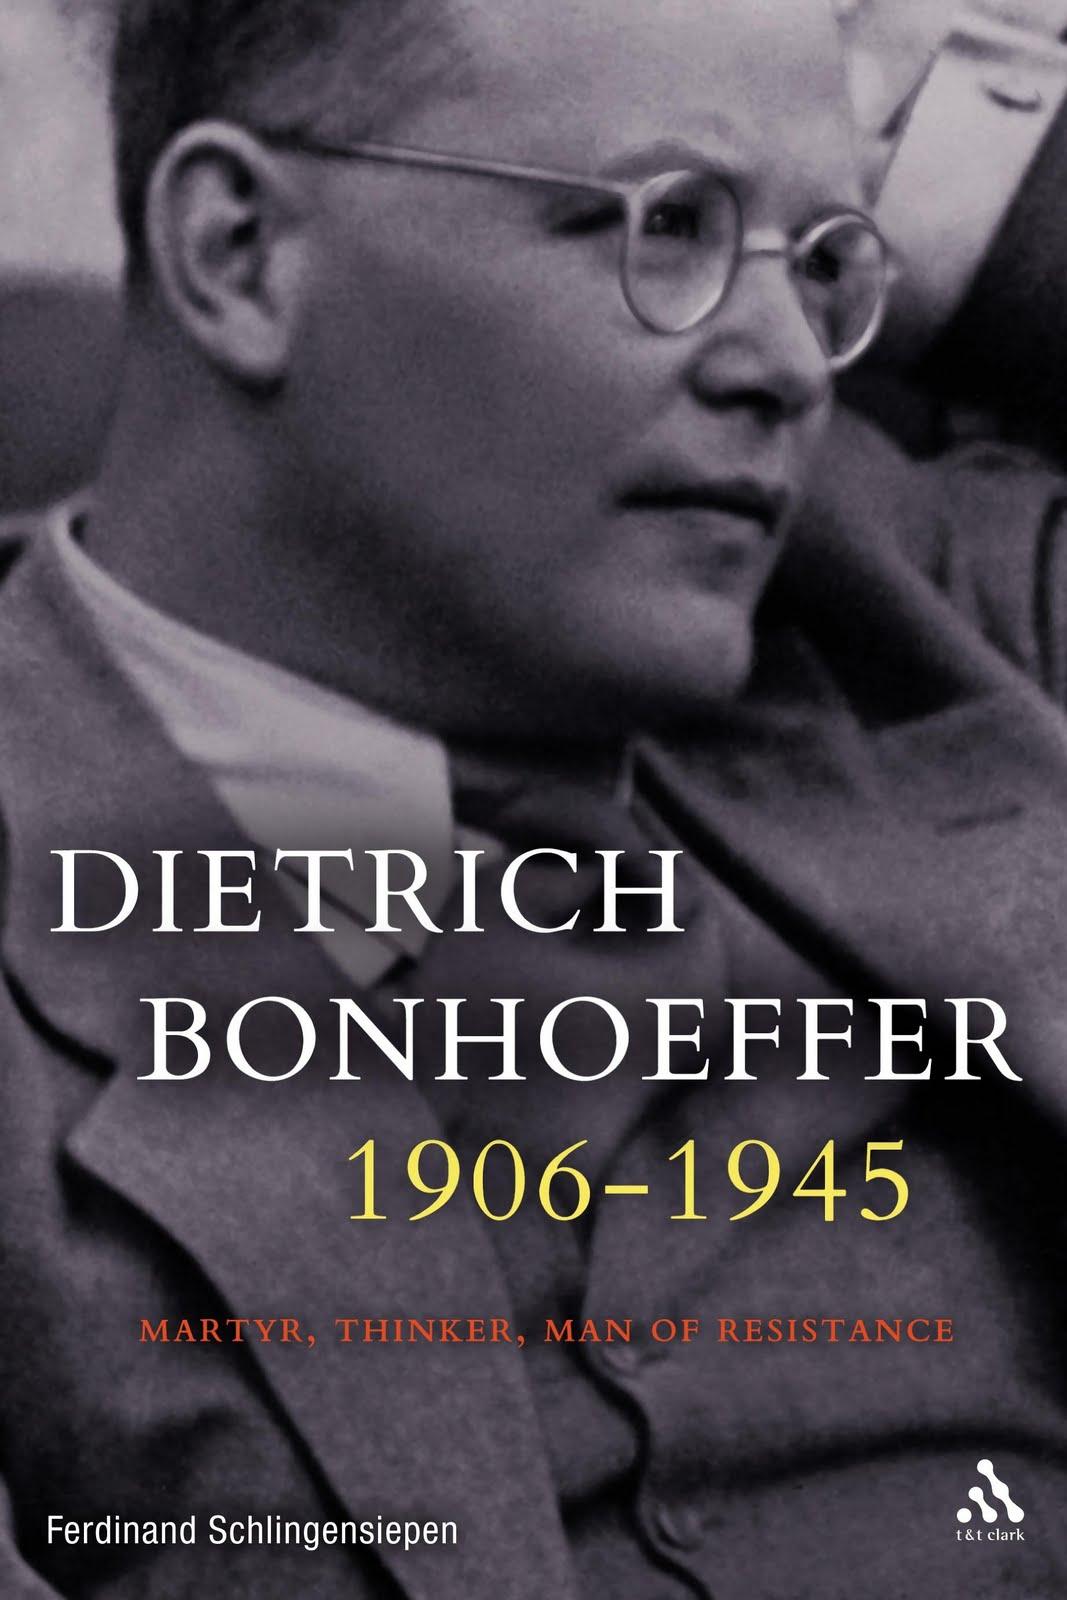 Dietrich Bonhoeffer Quotes On Death QuotesGram